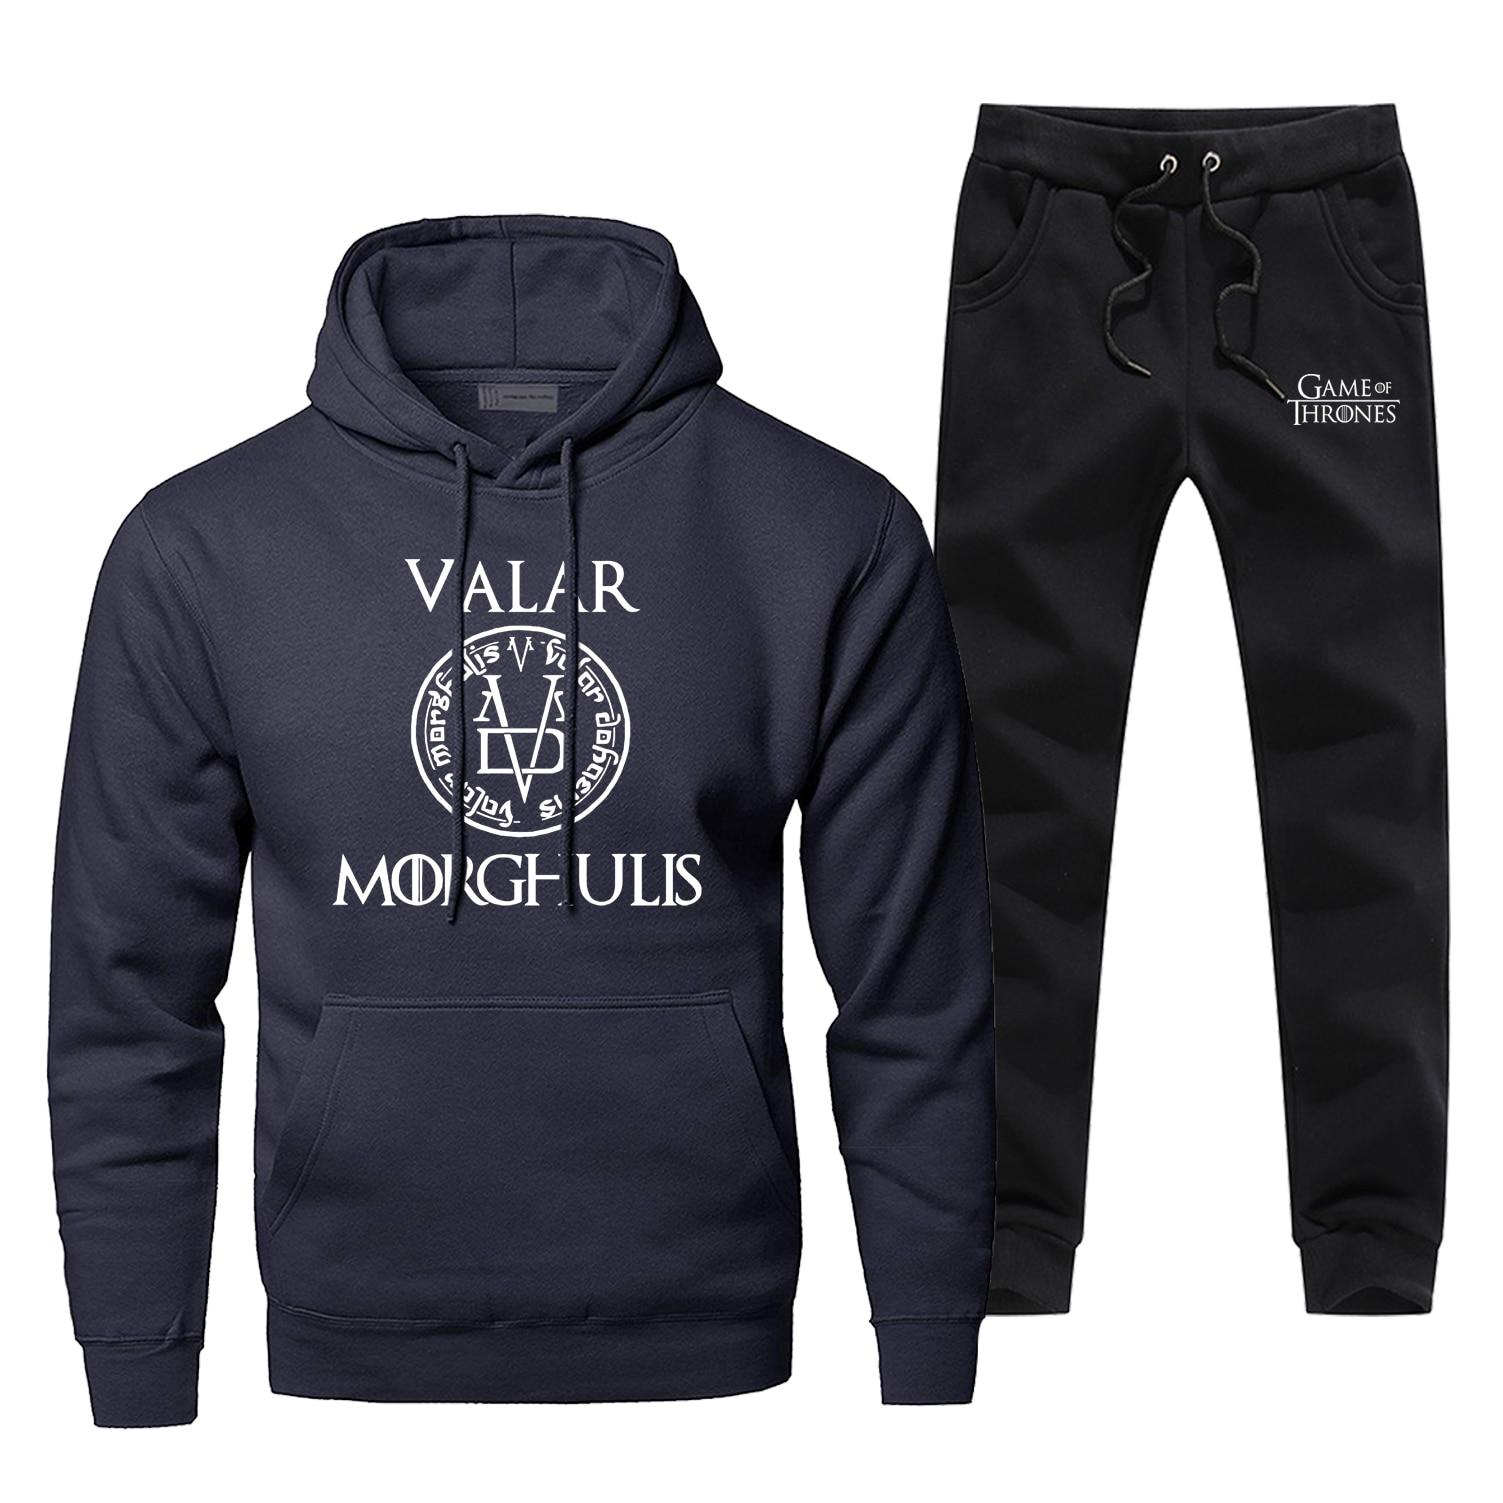 Valar Morghulis Game Of Thrones 2 Piece Set 2019 New Fashion Mens Sets Warm Complete Man Tracksuit Fleece Arya Stark Hoody Pants